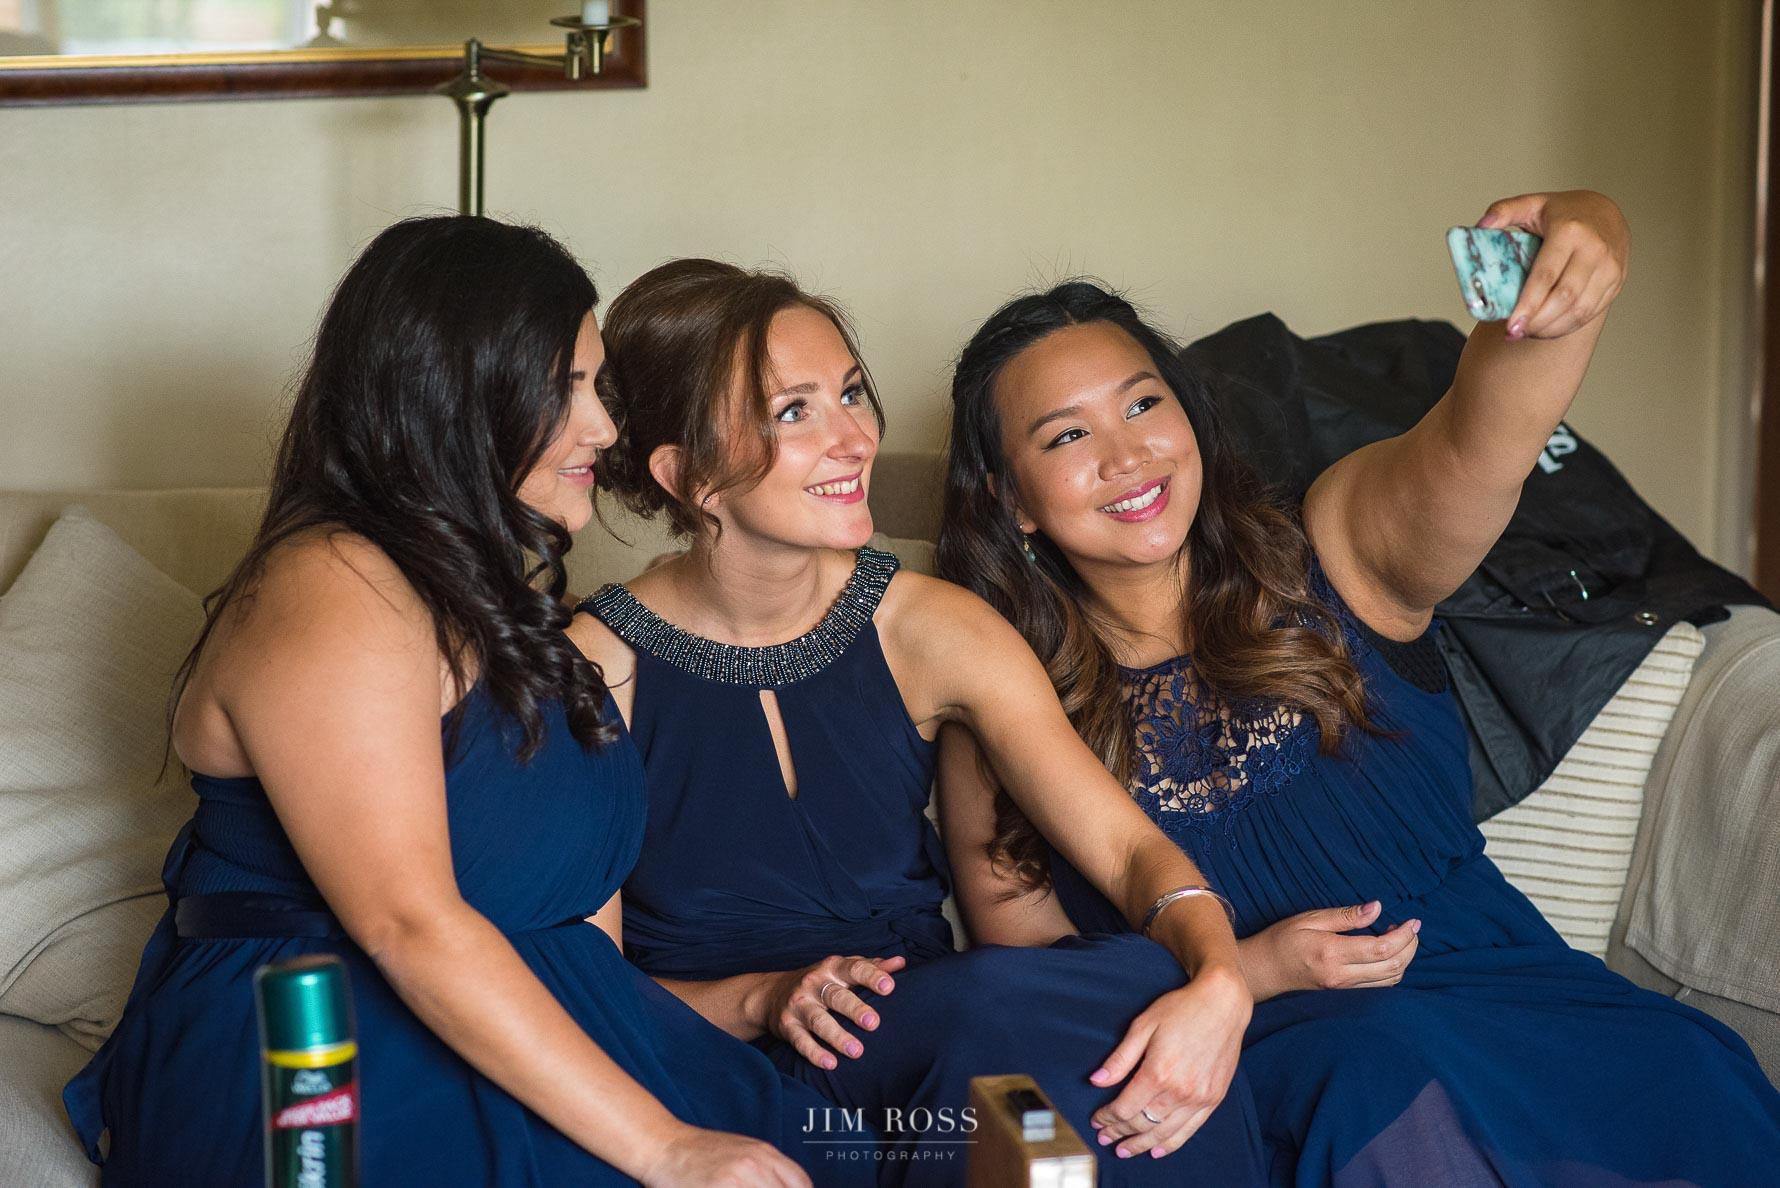 Bridesmaids selfie on sofa